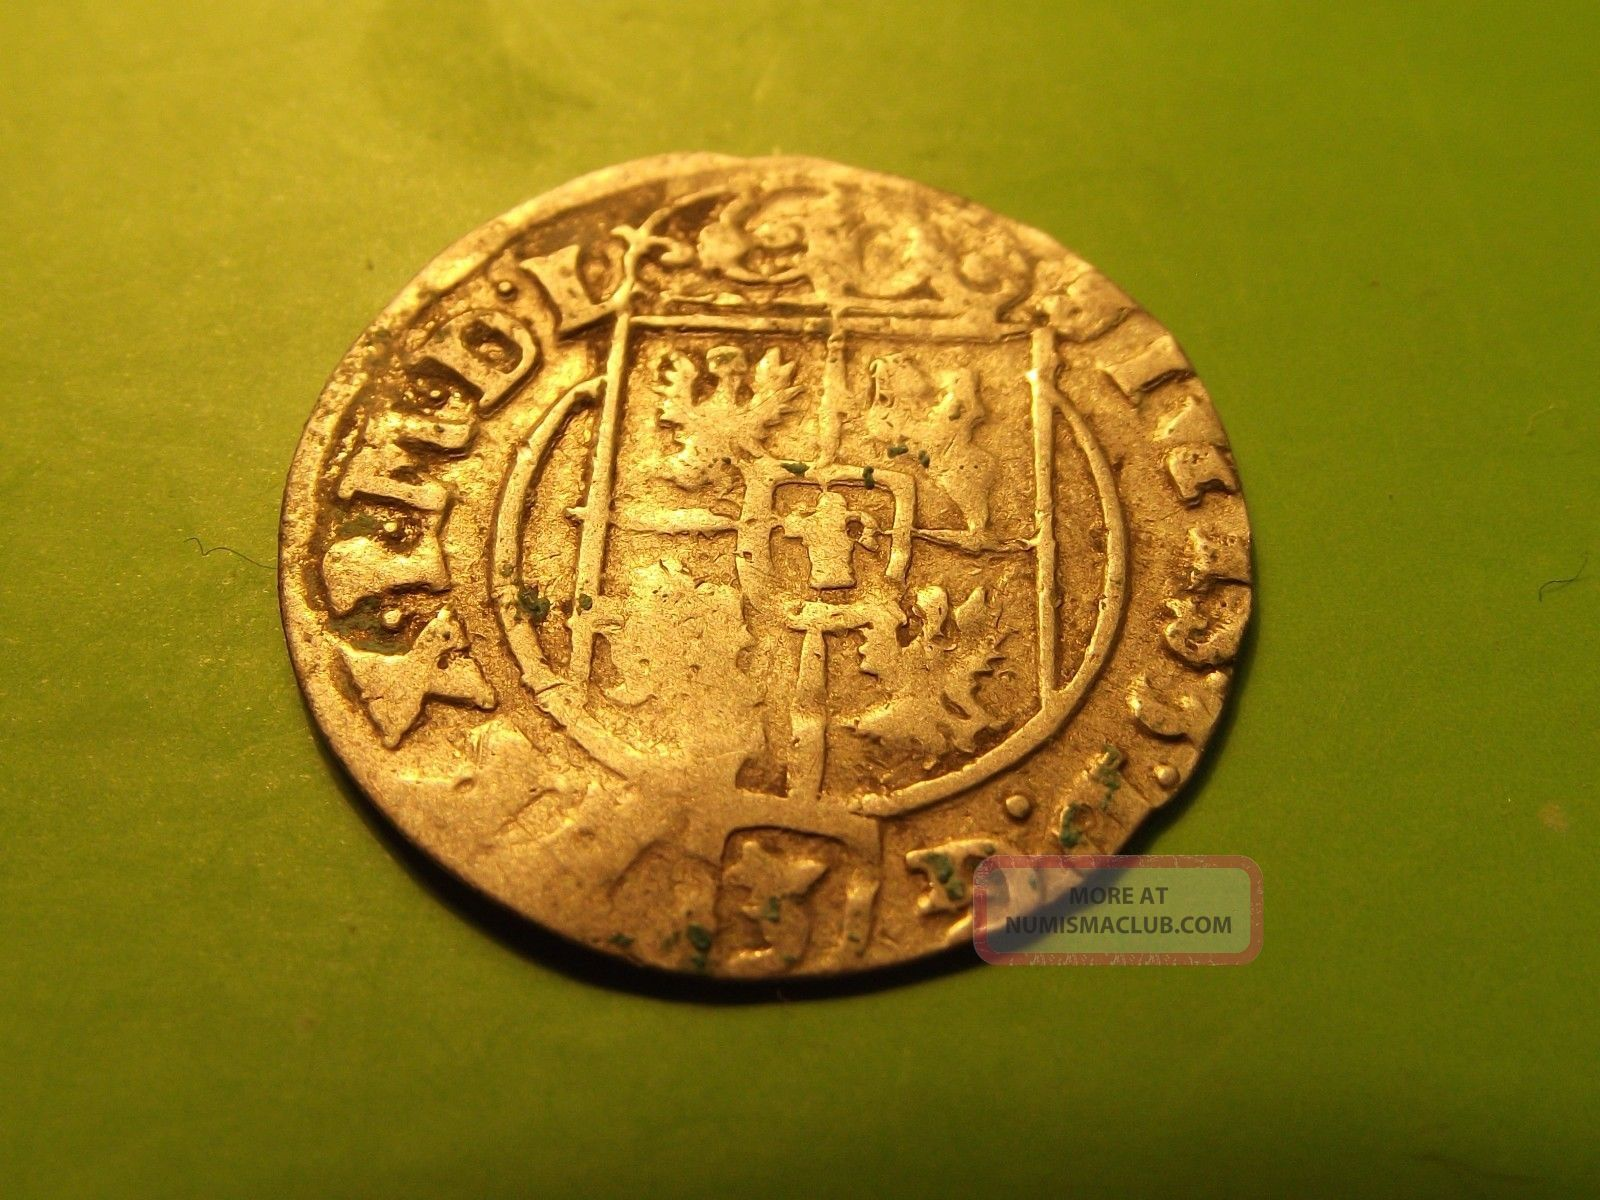 Lithuania Poland Rare 1625 Medival Silver 1/24 Thaler Sigismund Iii Coin Km 11 Europe photo